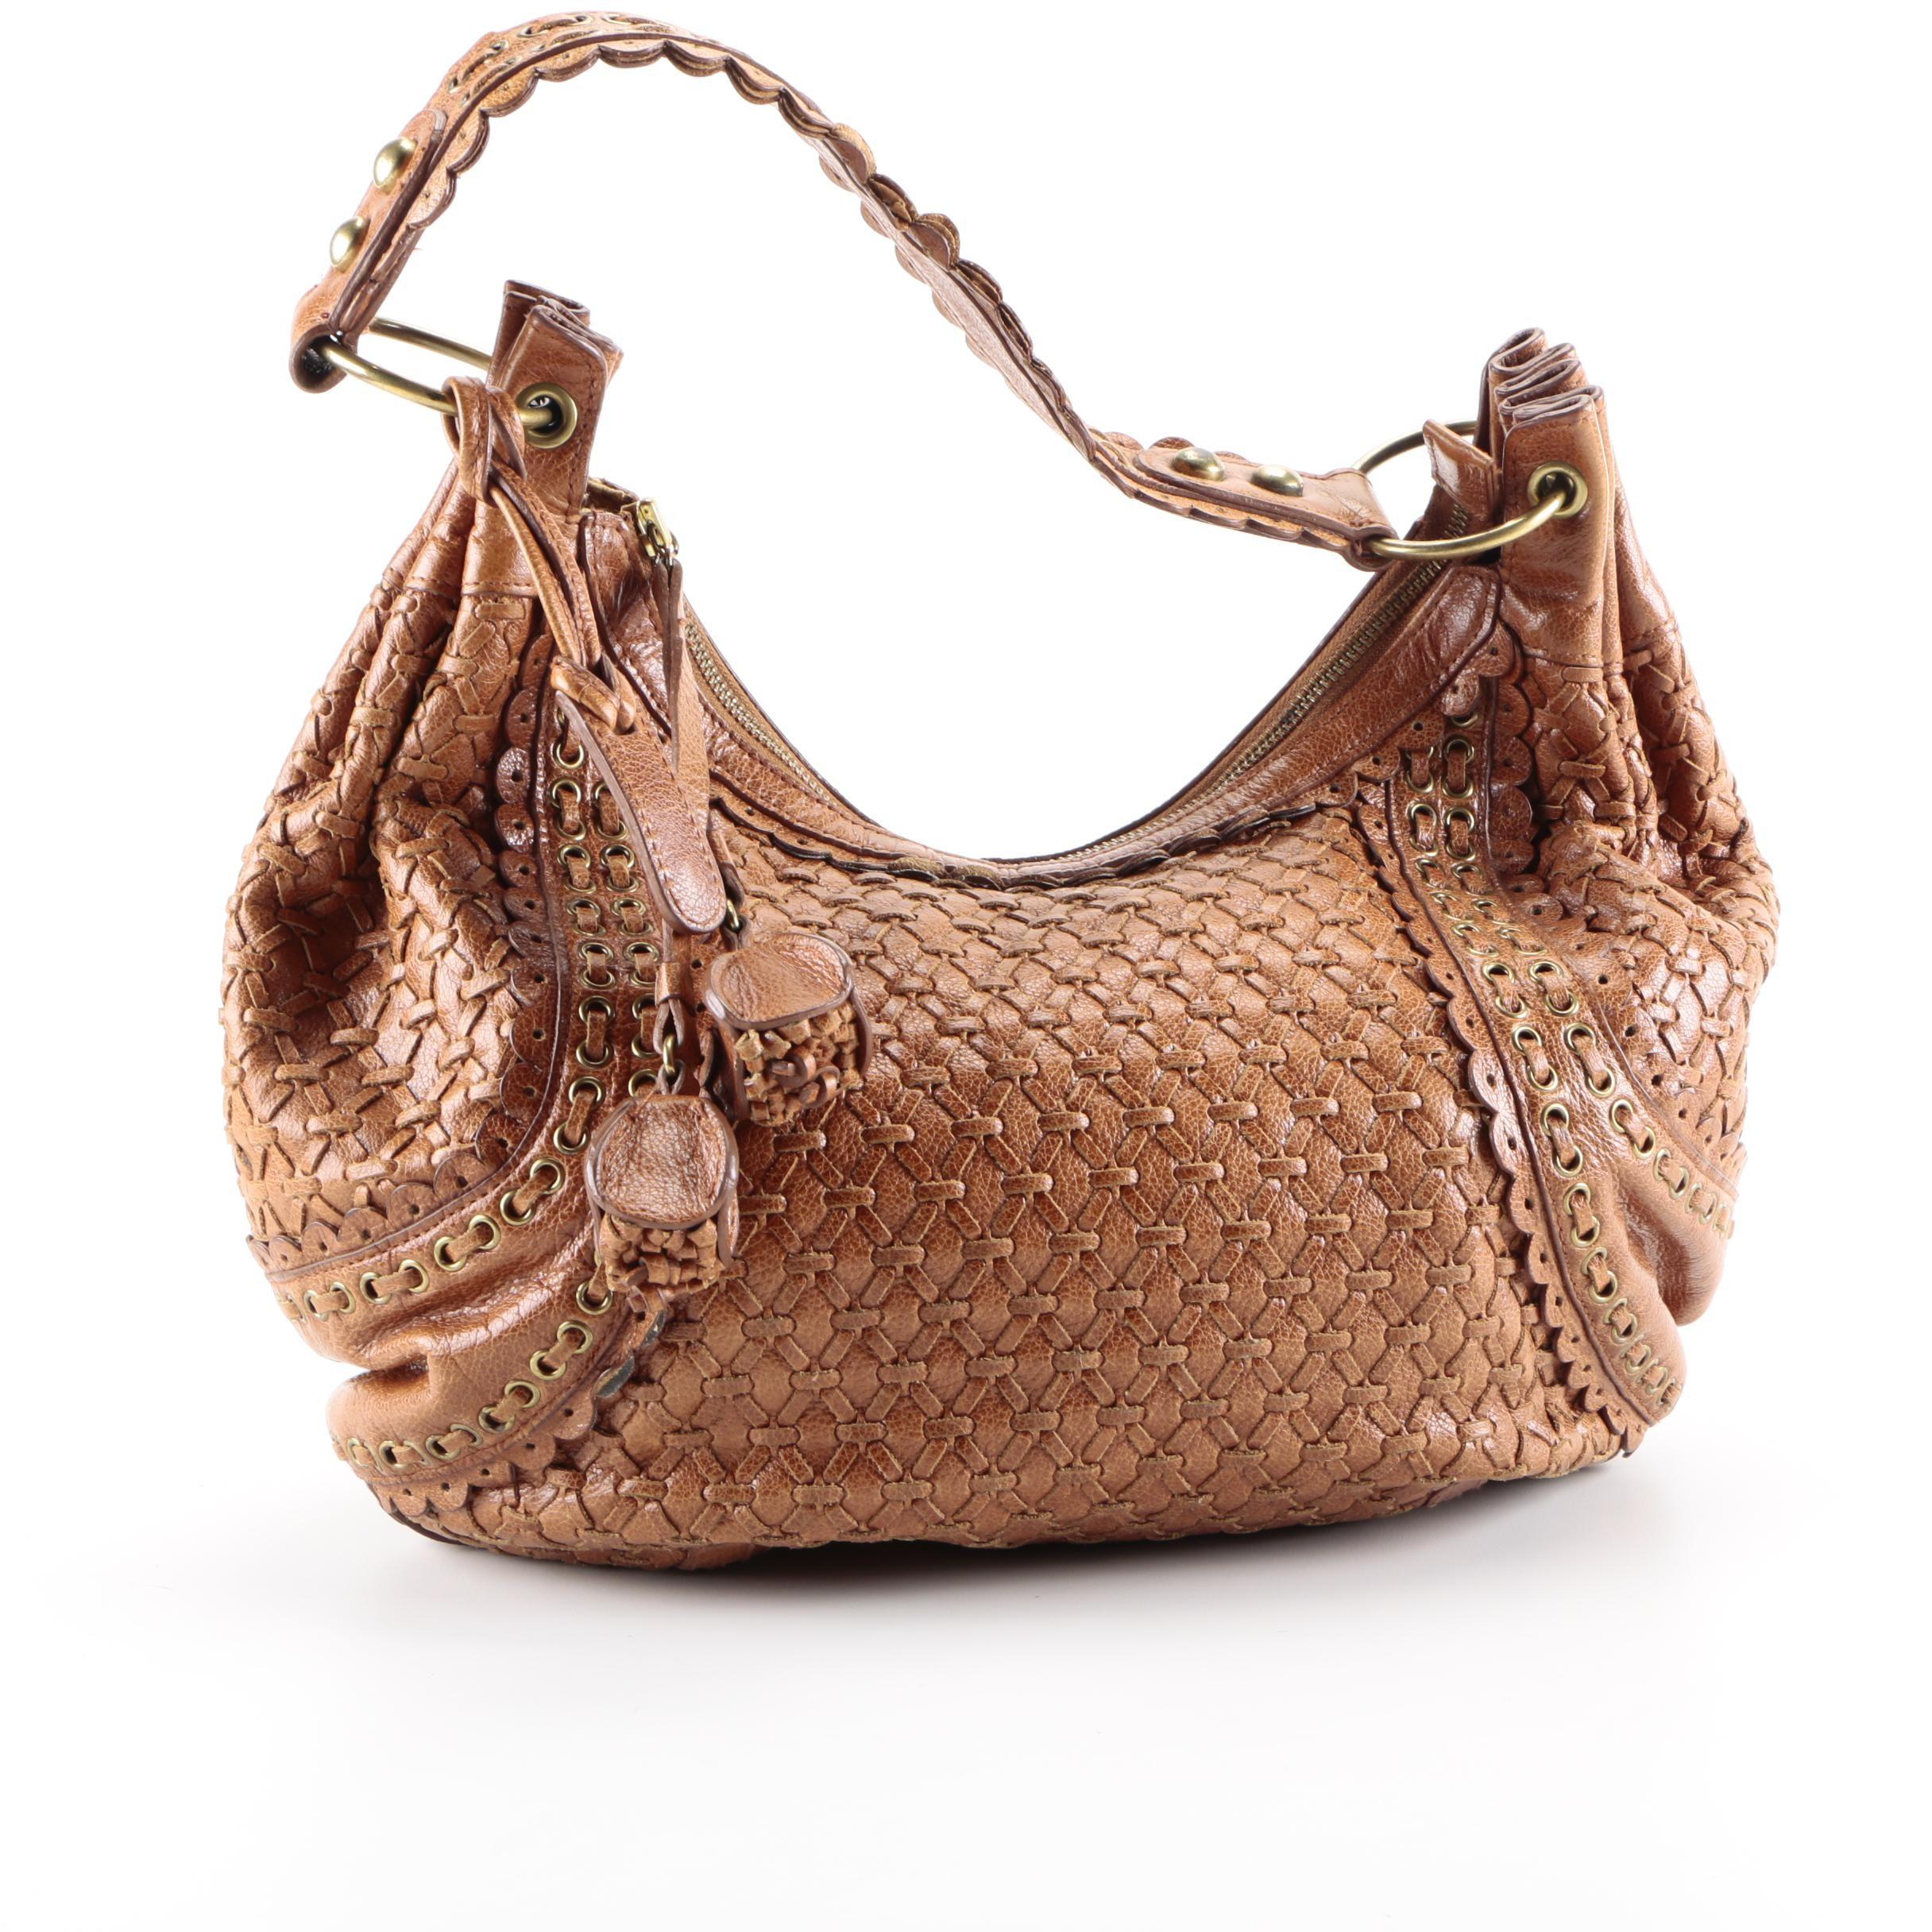 Isabella Fiore Brown Leather Handbag